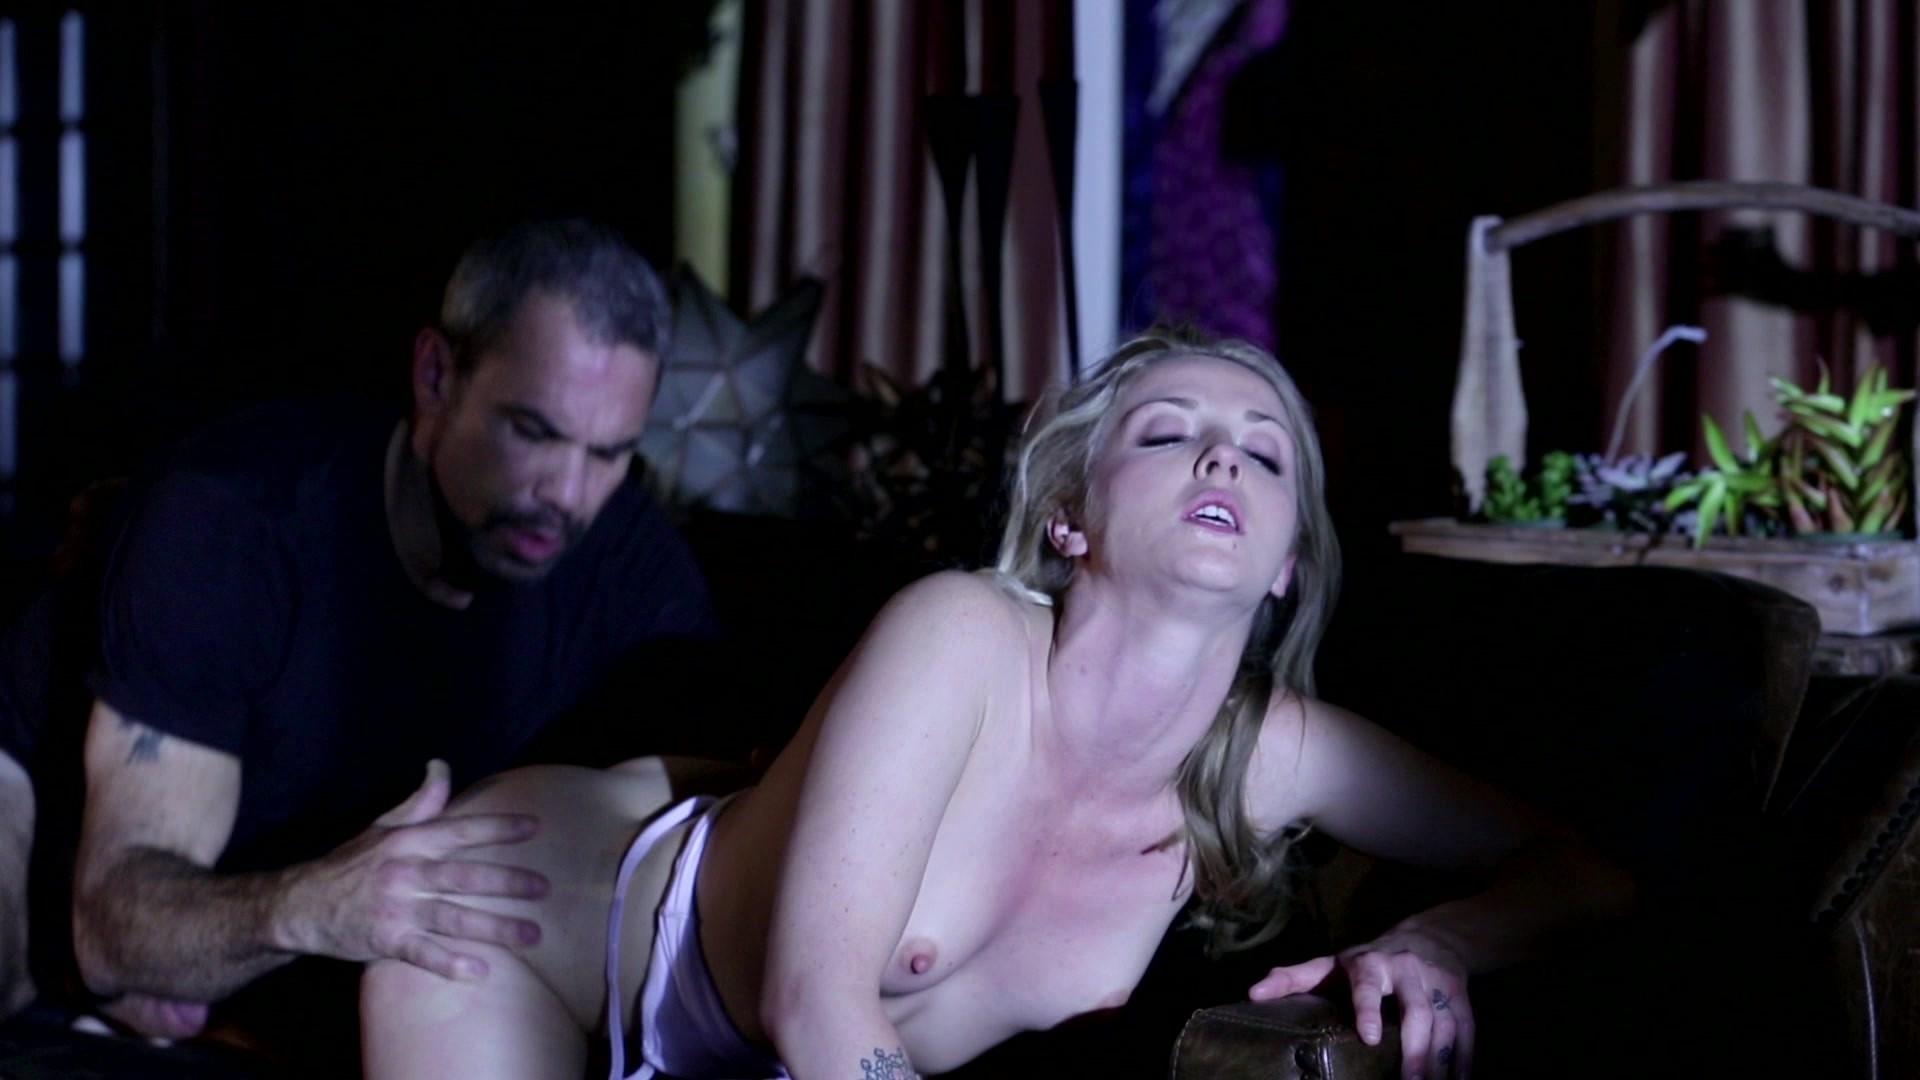 forbidden-movies-turn-back-sex-porn-wife-anal-masturbate